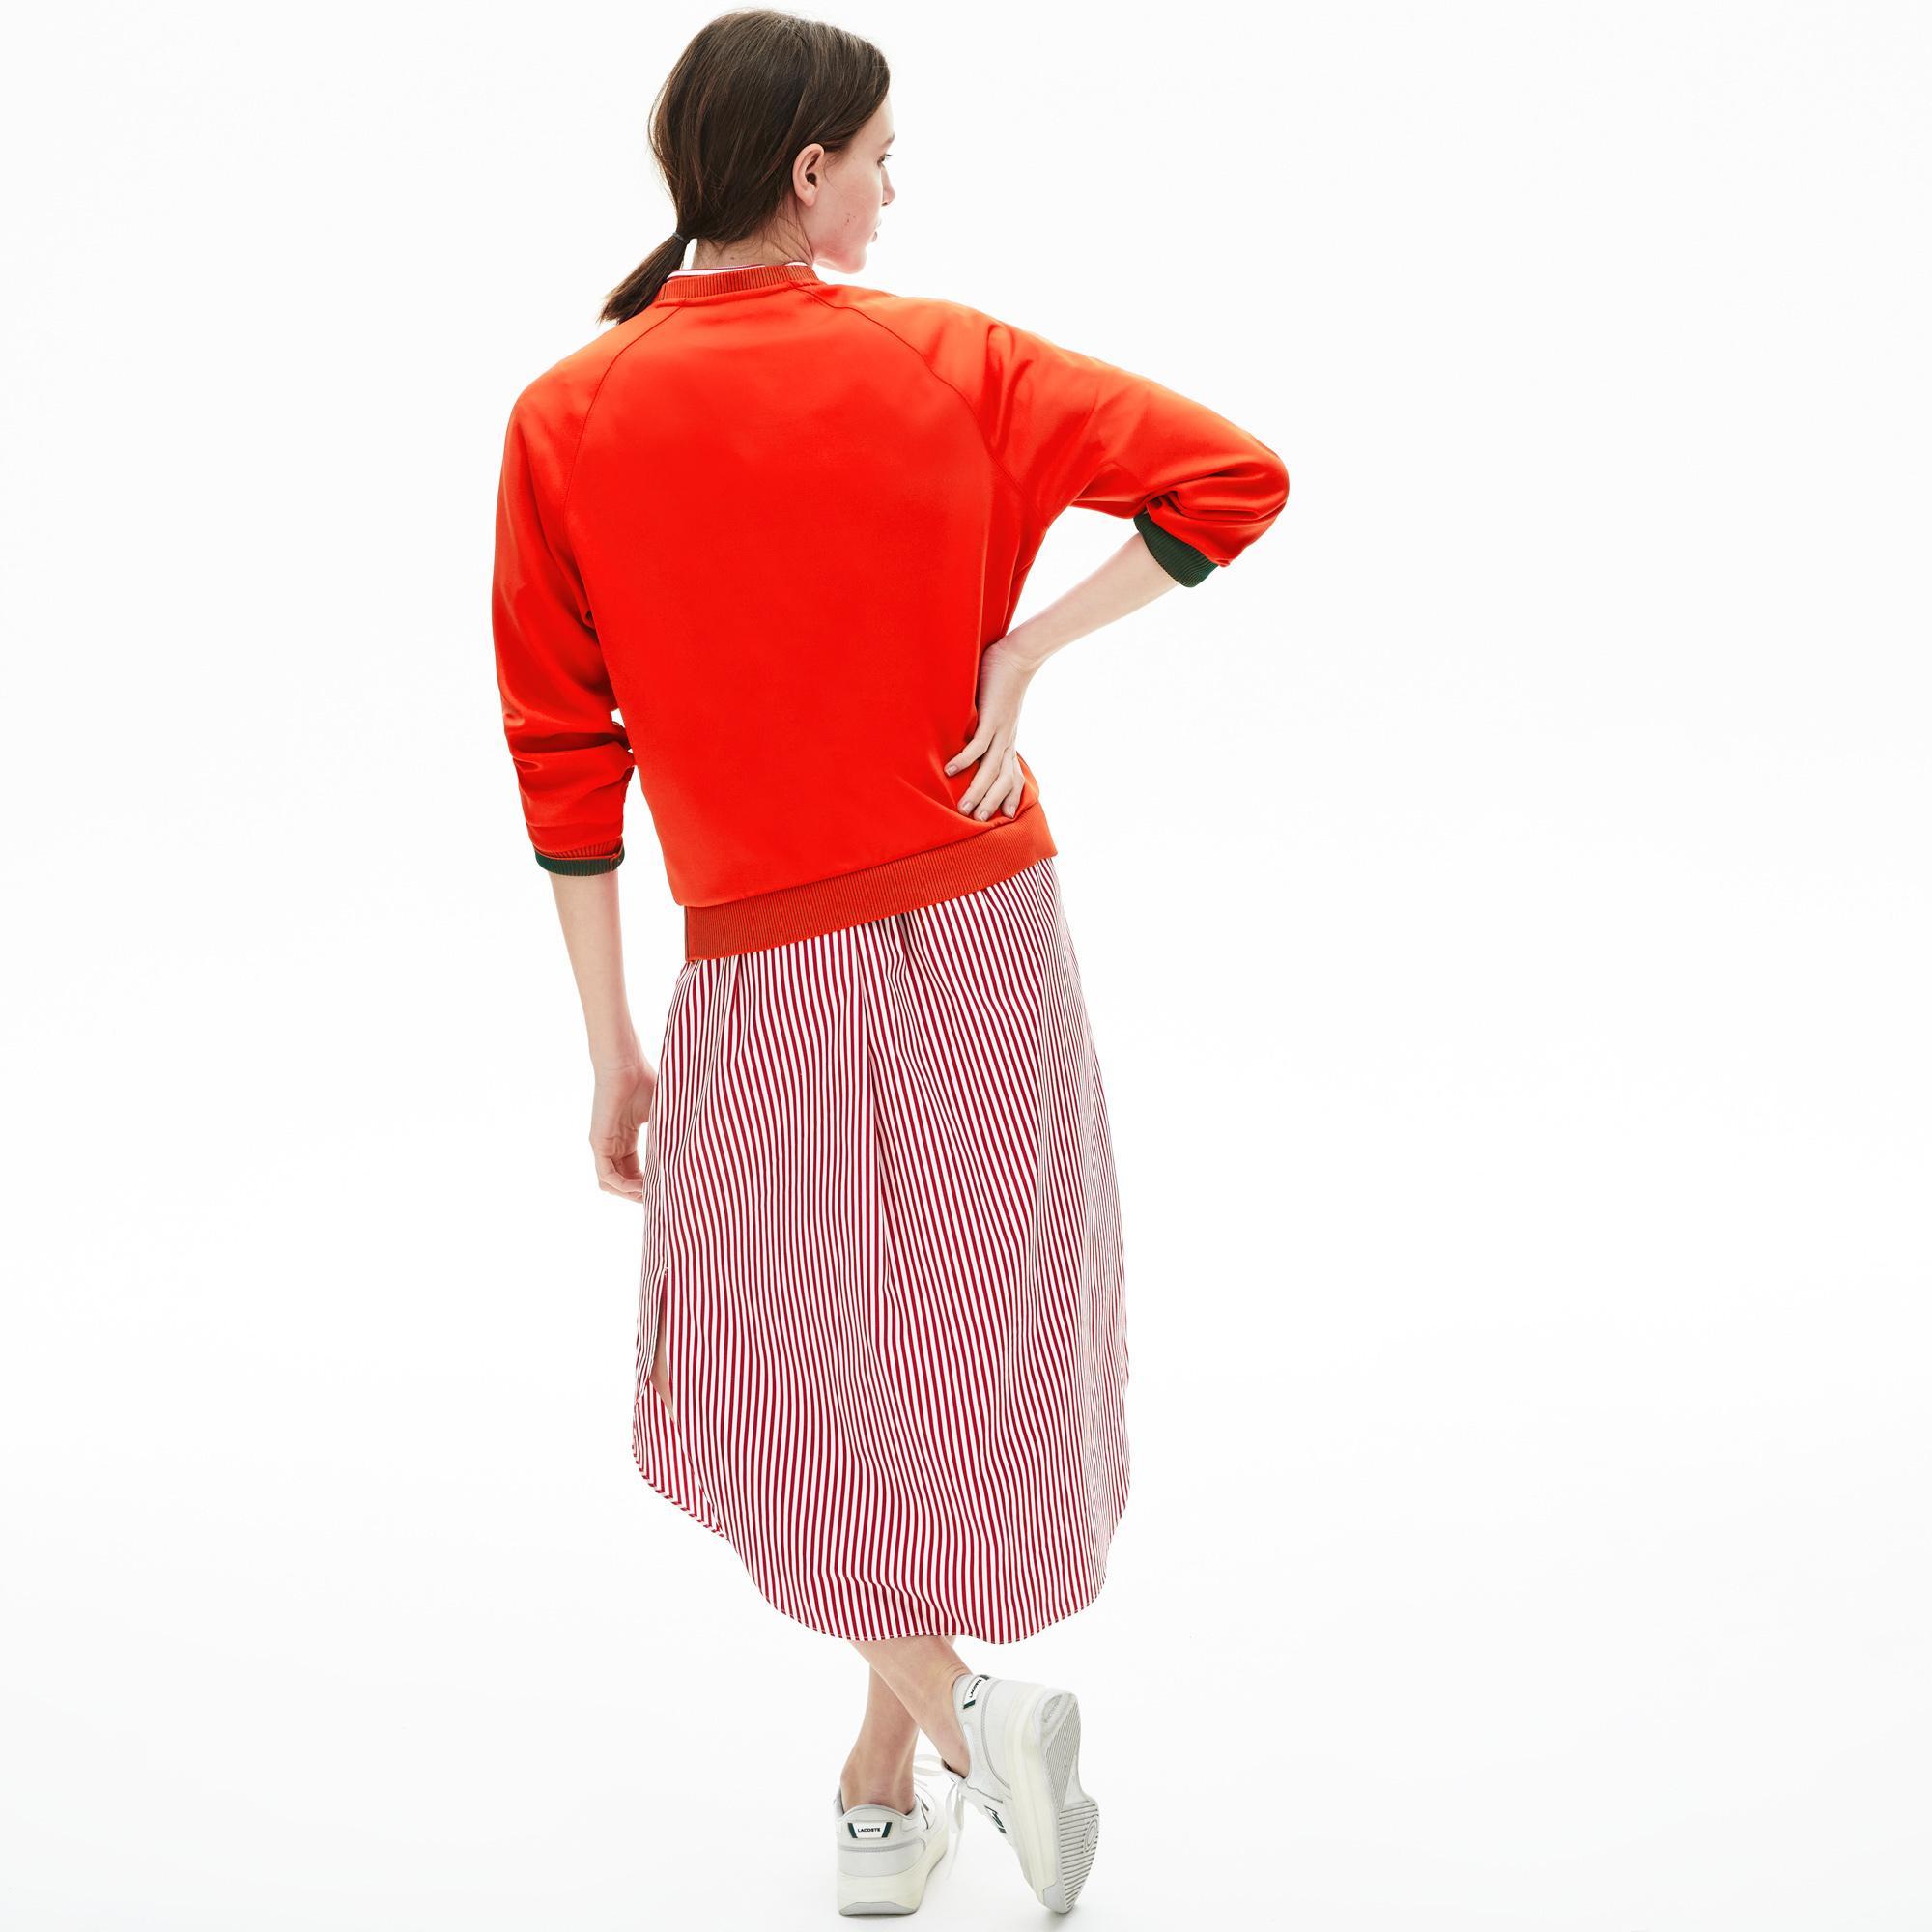 Lacoste Women's Classic Crew Neck Sweatshirt